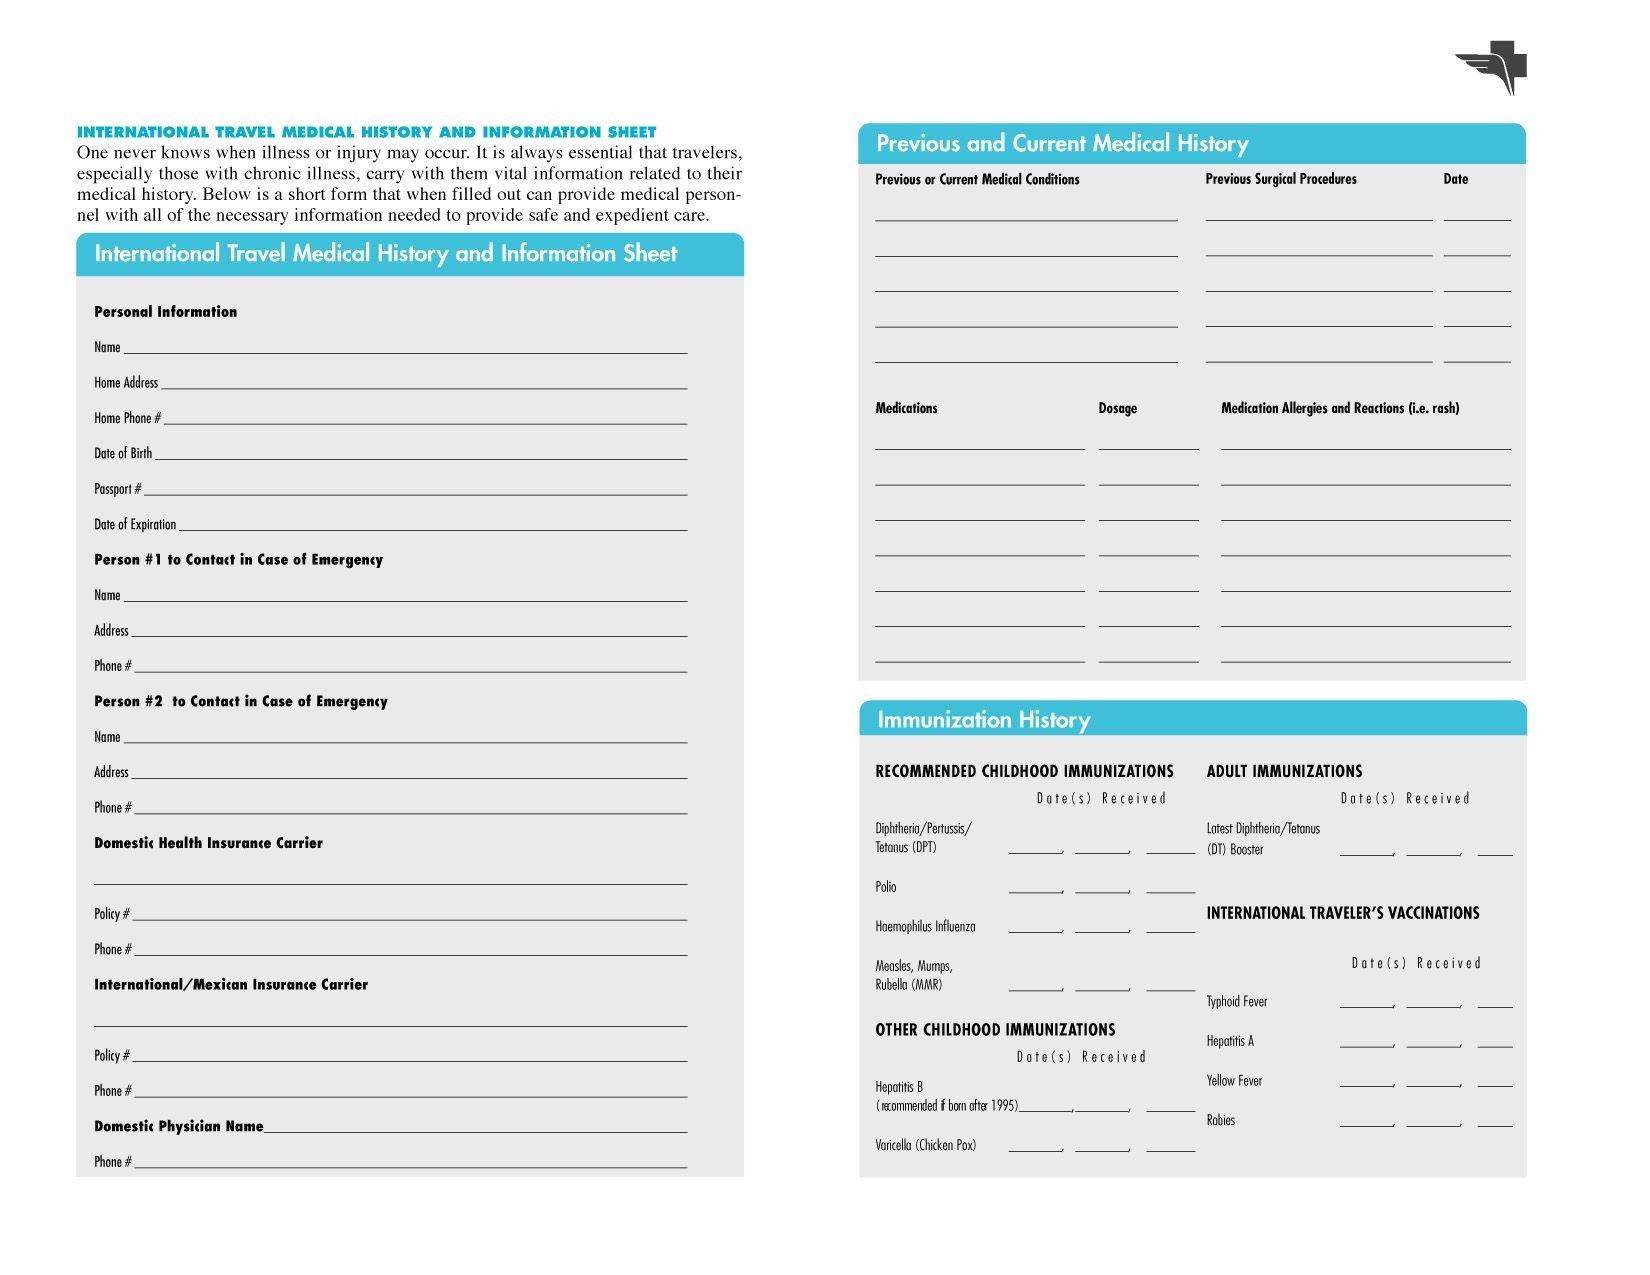 Free Printables | Free Printable Family Medical History Forms - Free Printable Medical Forms Kit